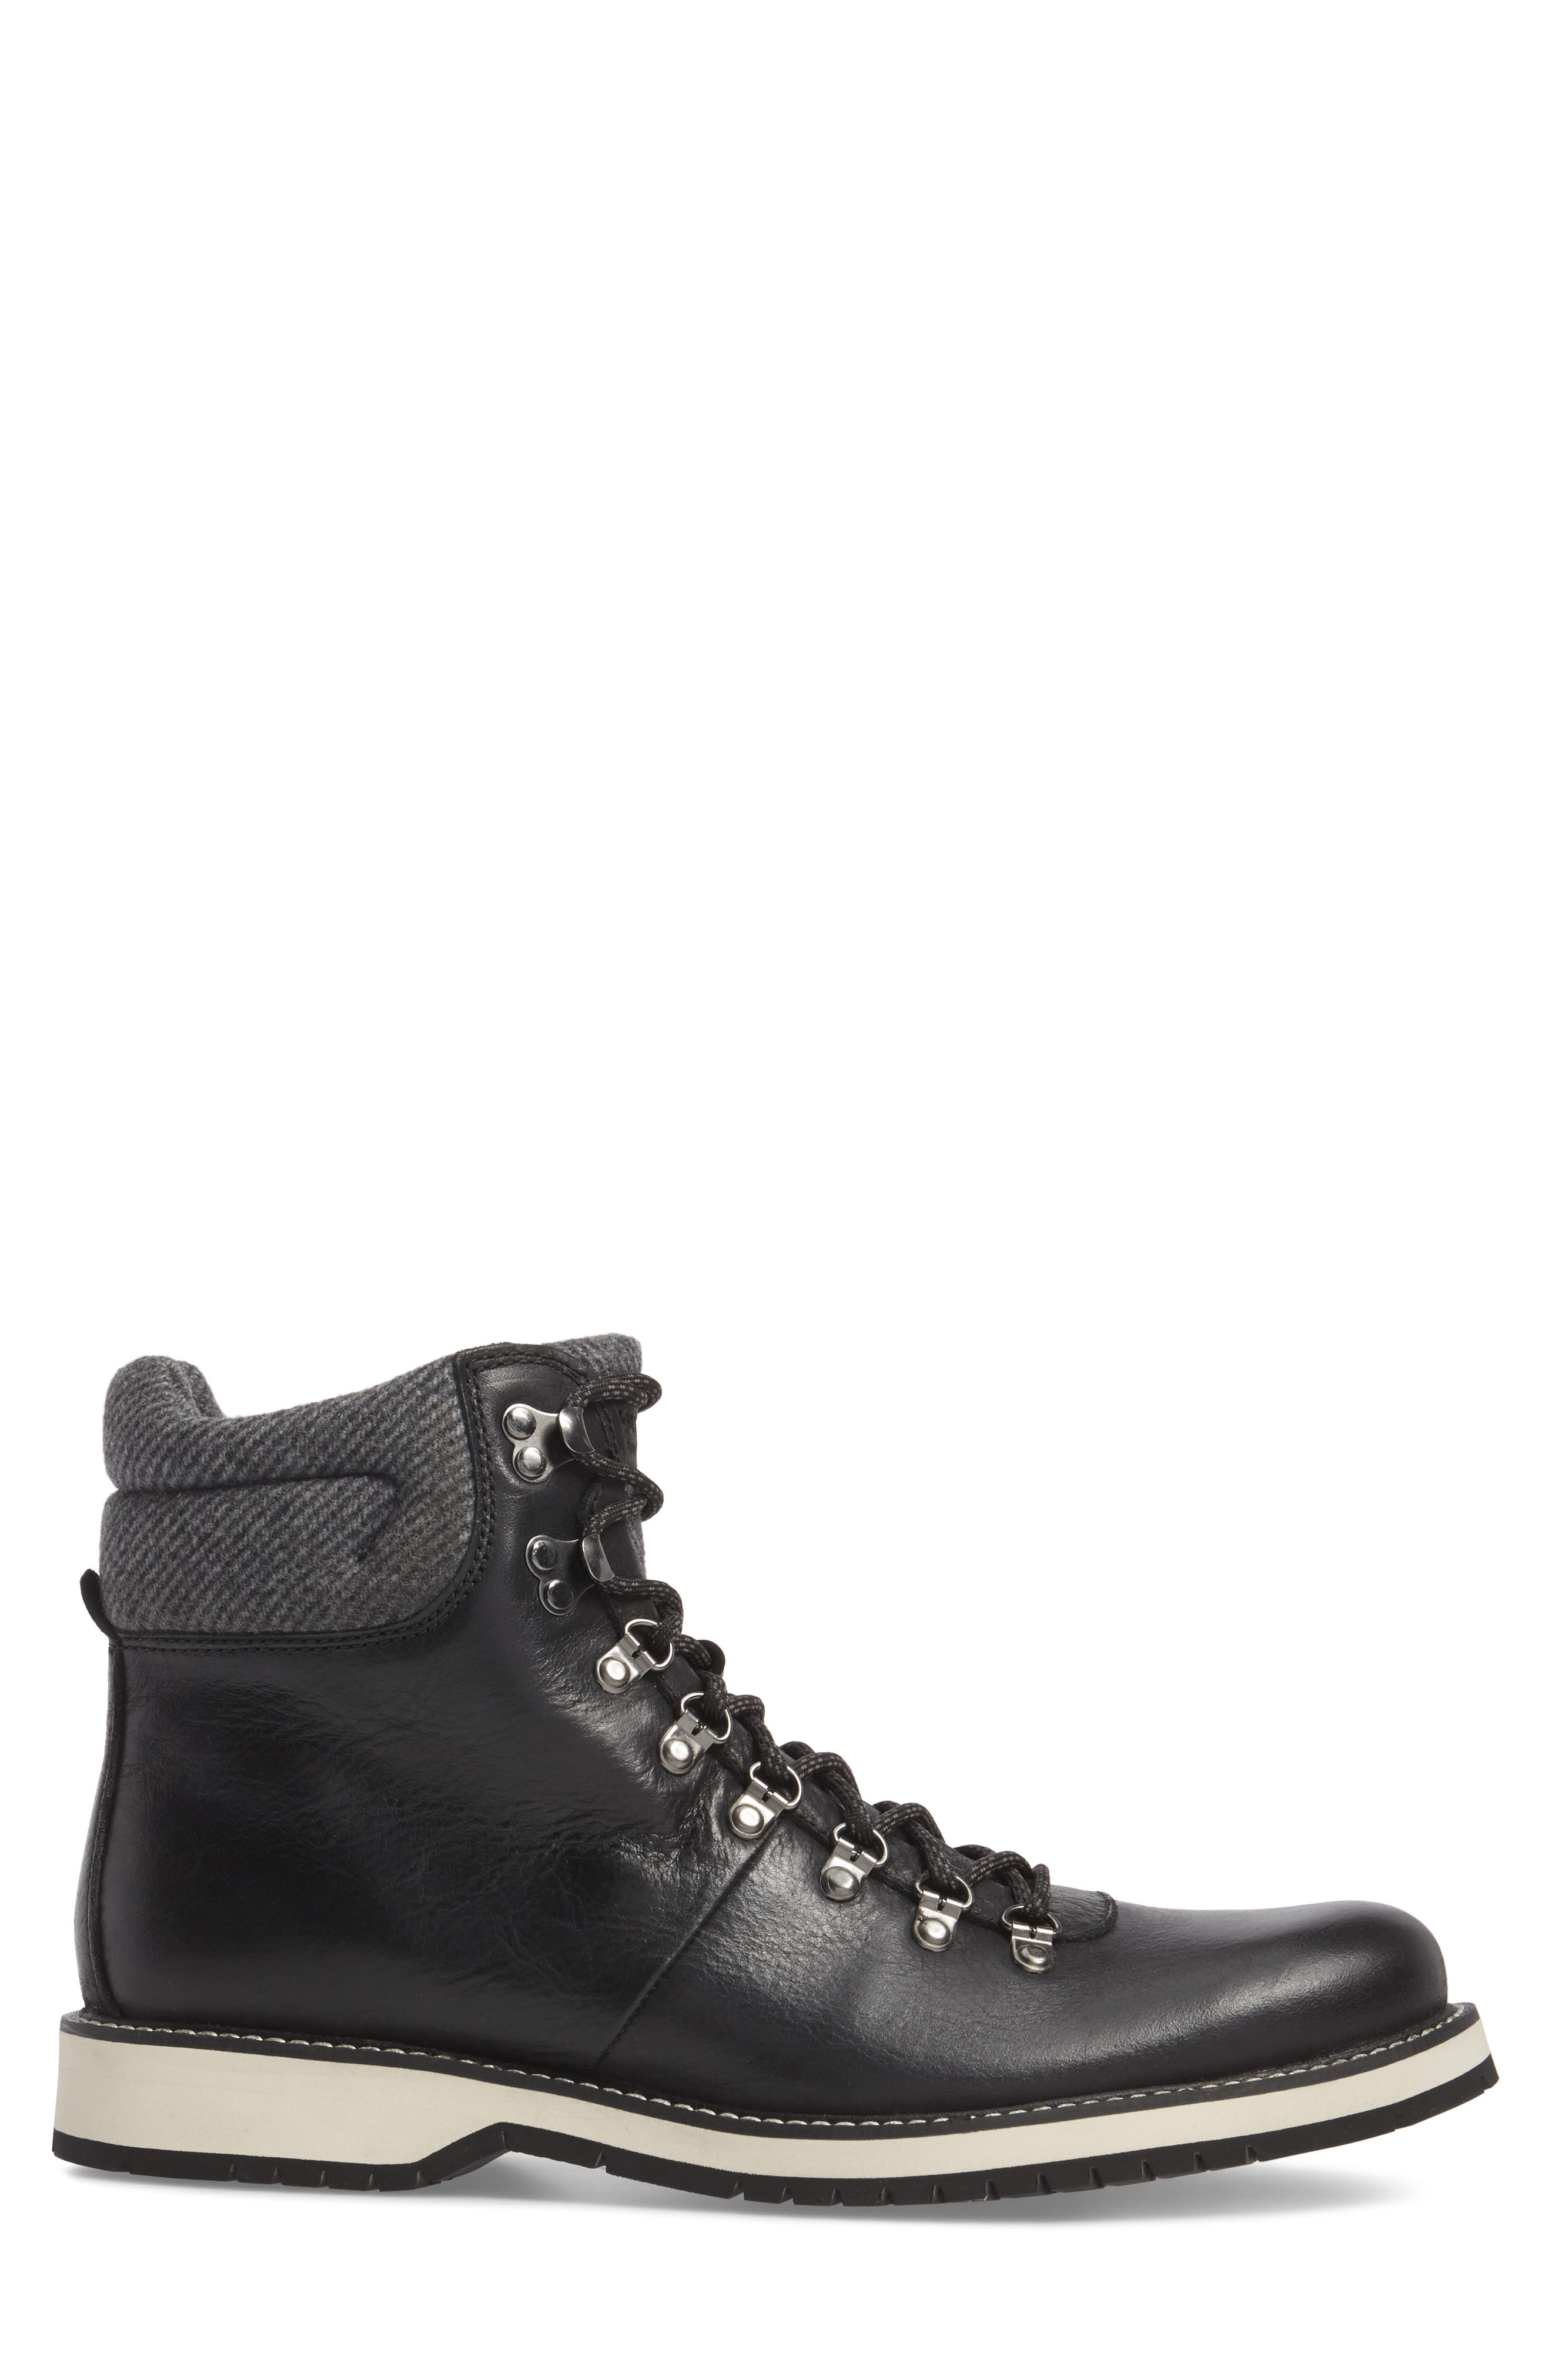 Sidney Waterproof Plain Toe Boot,                             Alternate thumbnail 3, color,                             001